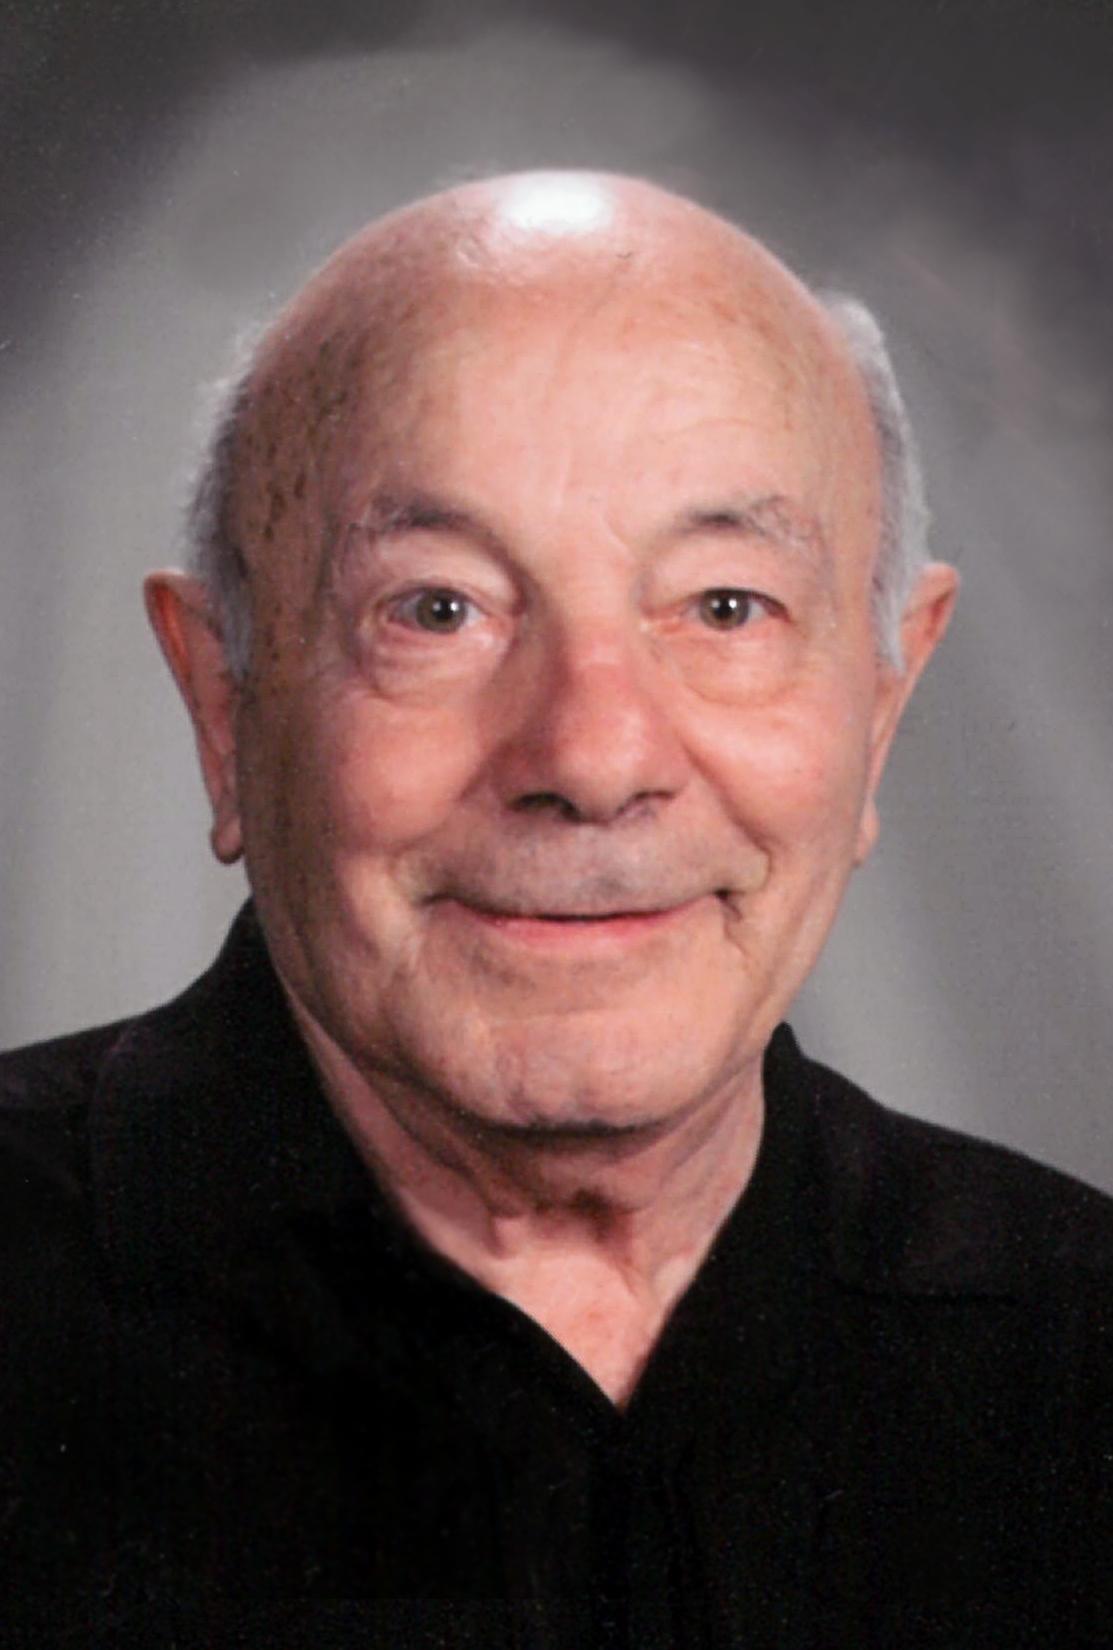 Obituary: Gerald G. Sackman Enjoyed Snowmobiles And Hunting